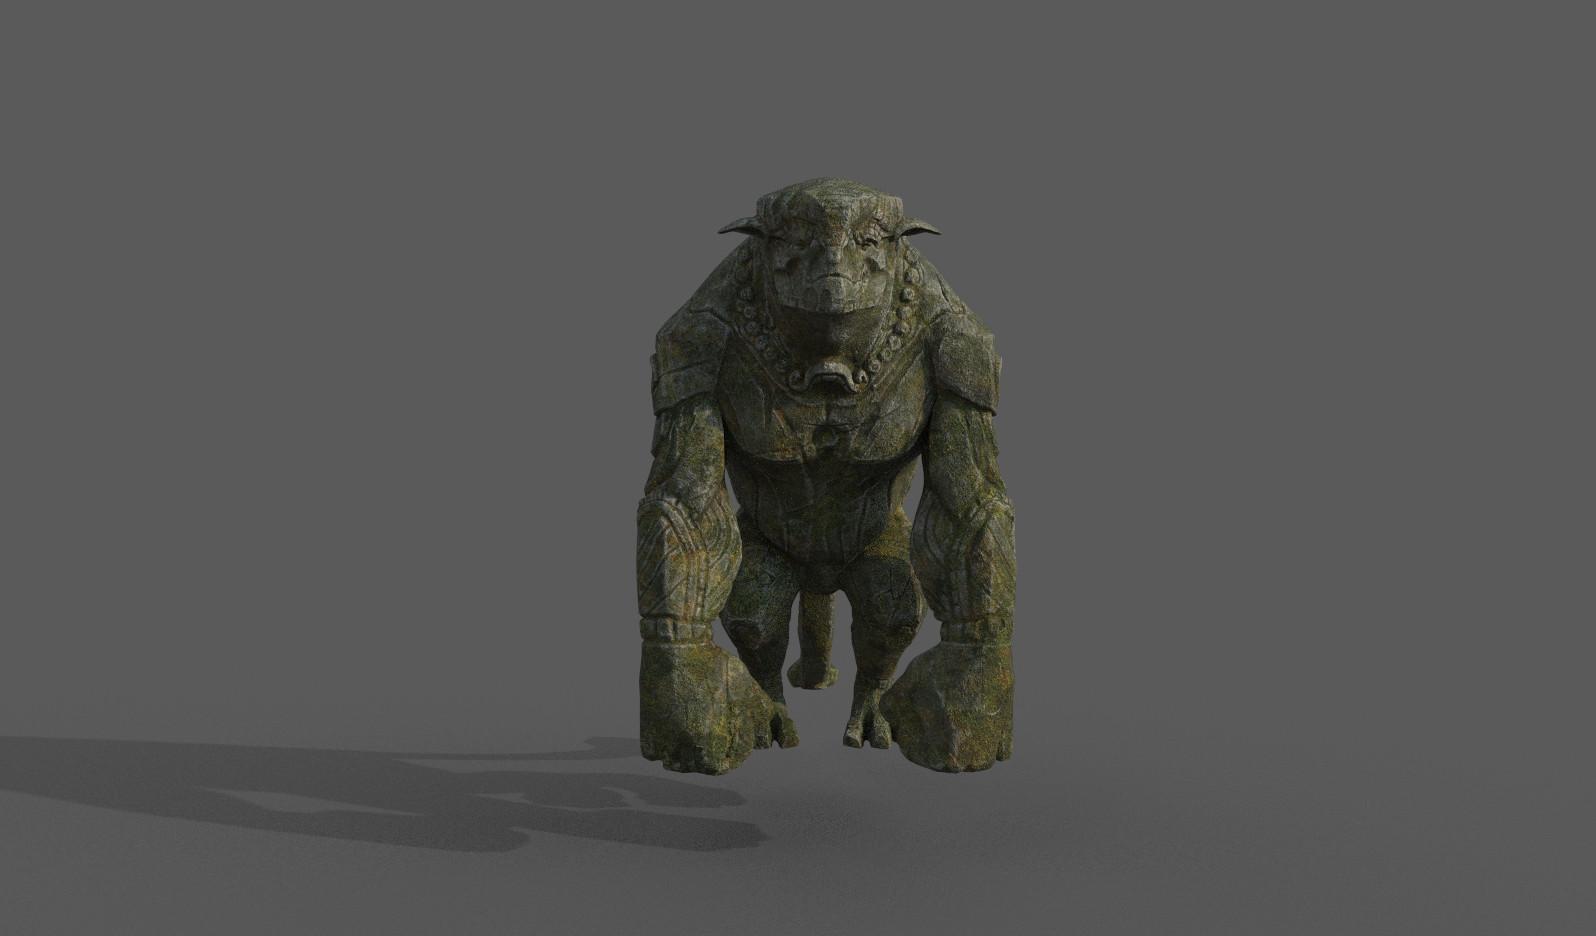 Darko mitev beast statuev2 02